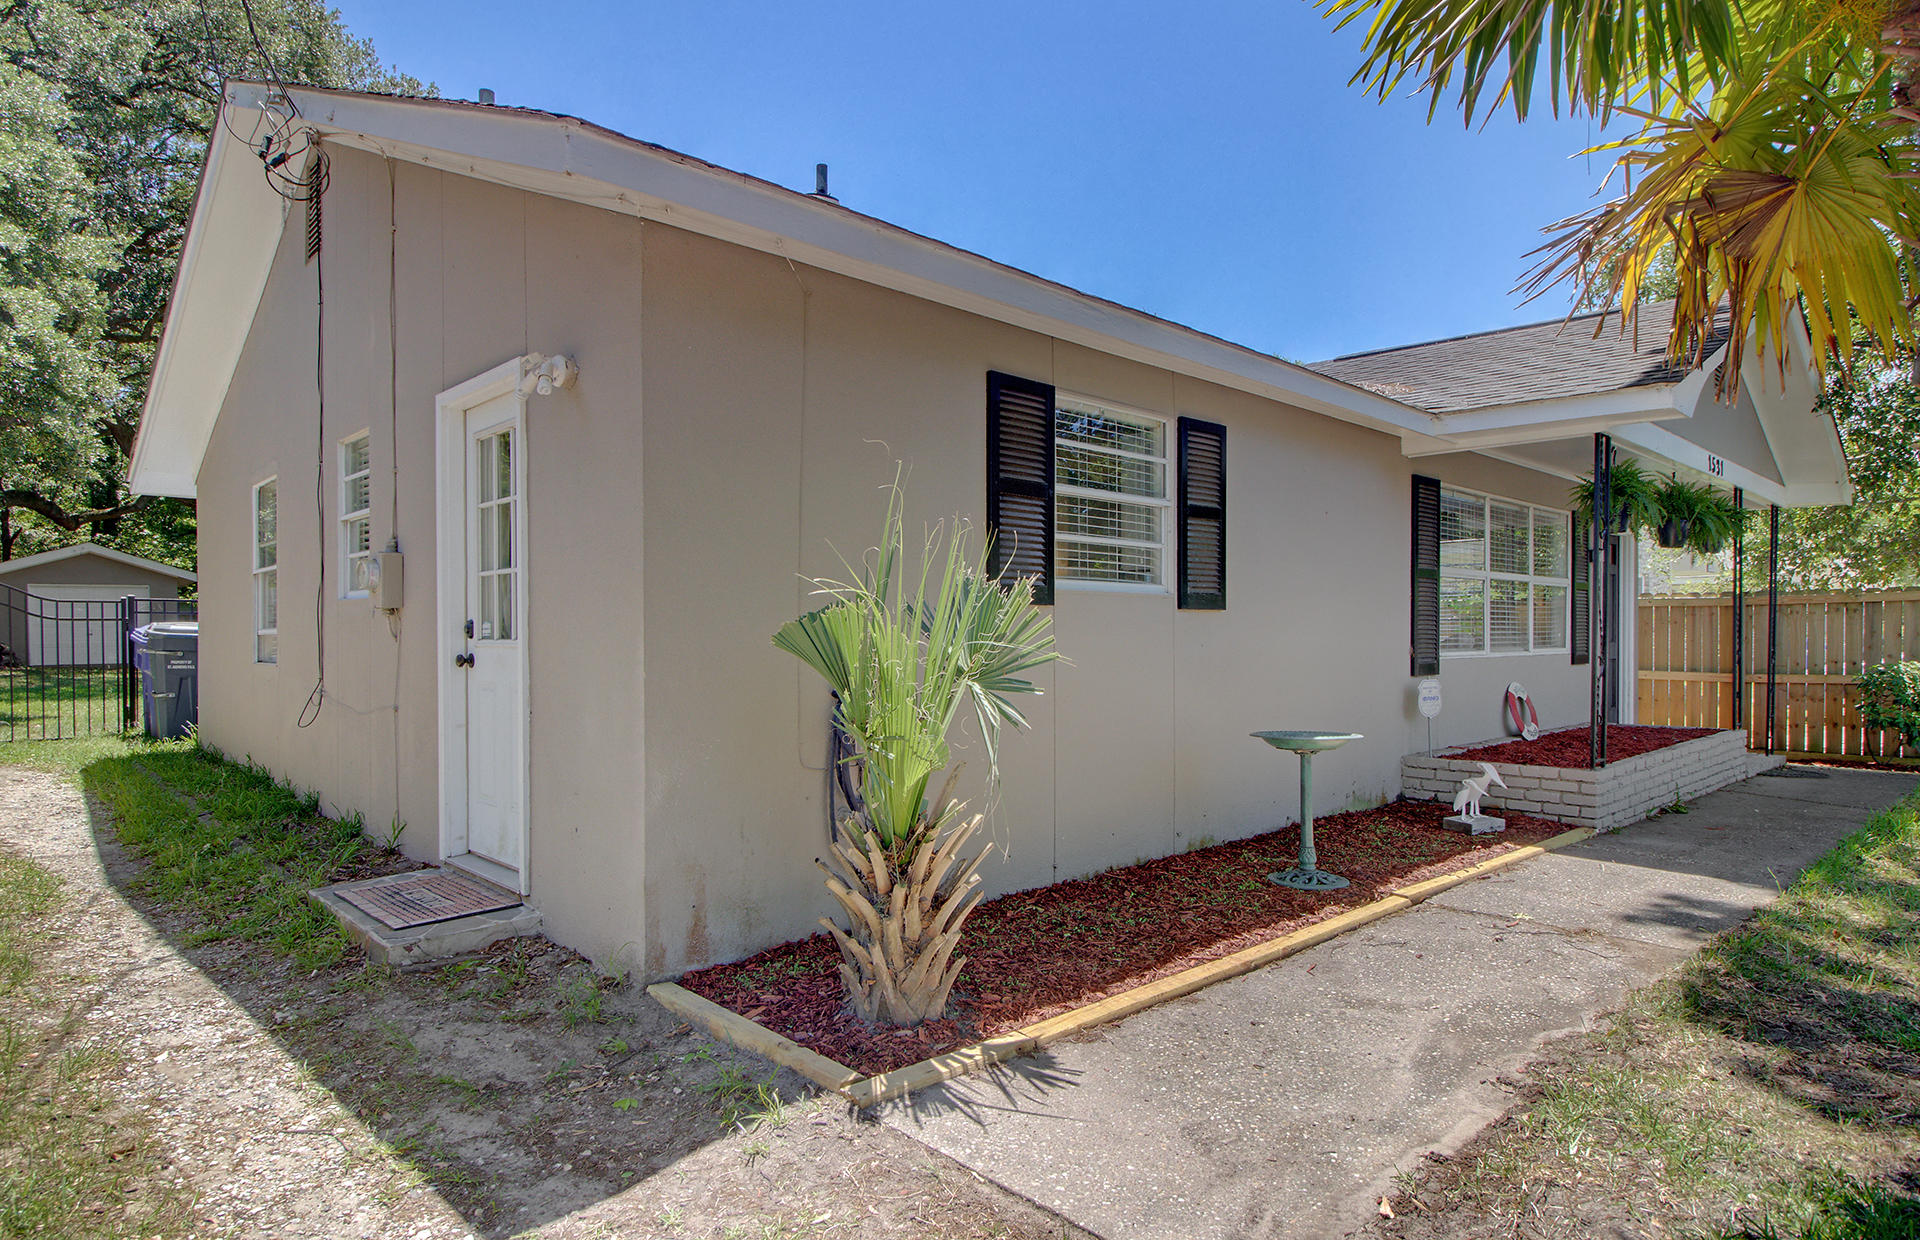 Orange Grove Estates Homes For Sale - 1531 Avalon, Charleston, SC - 28